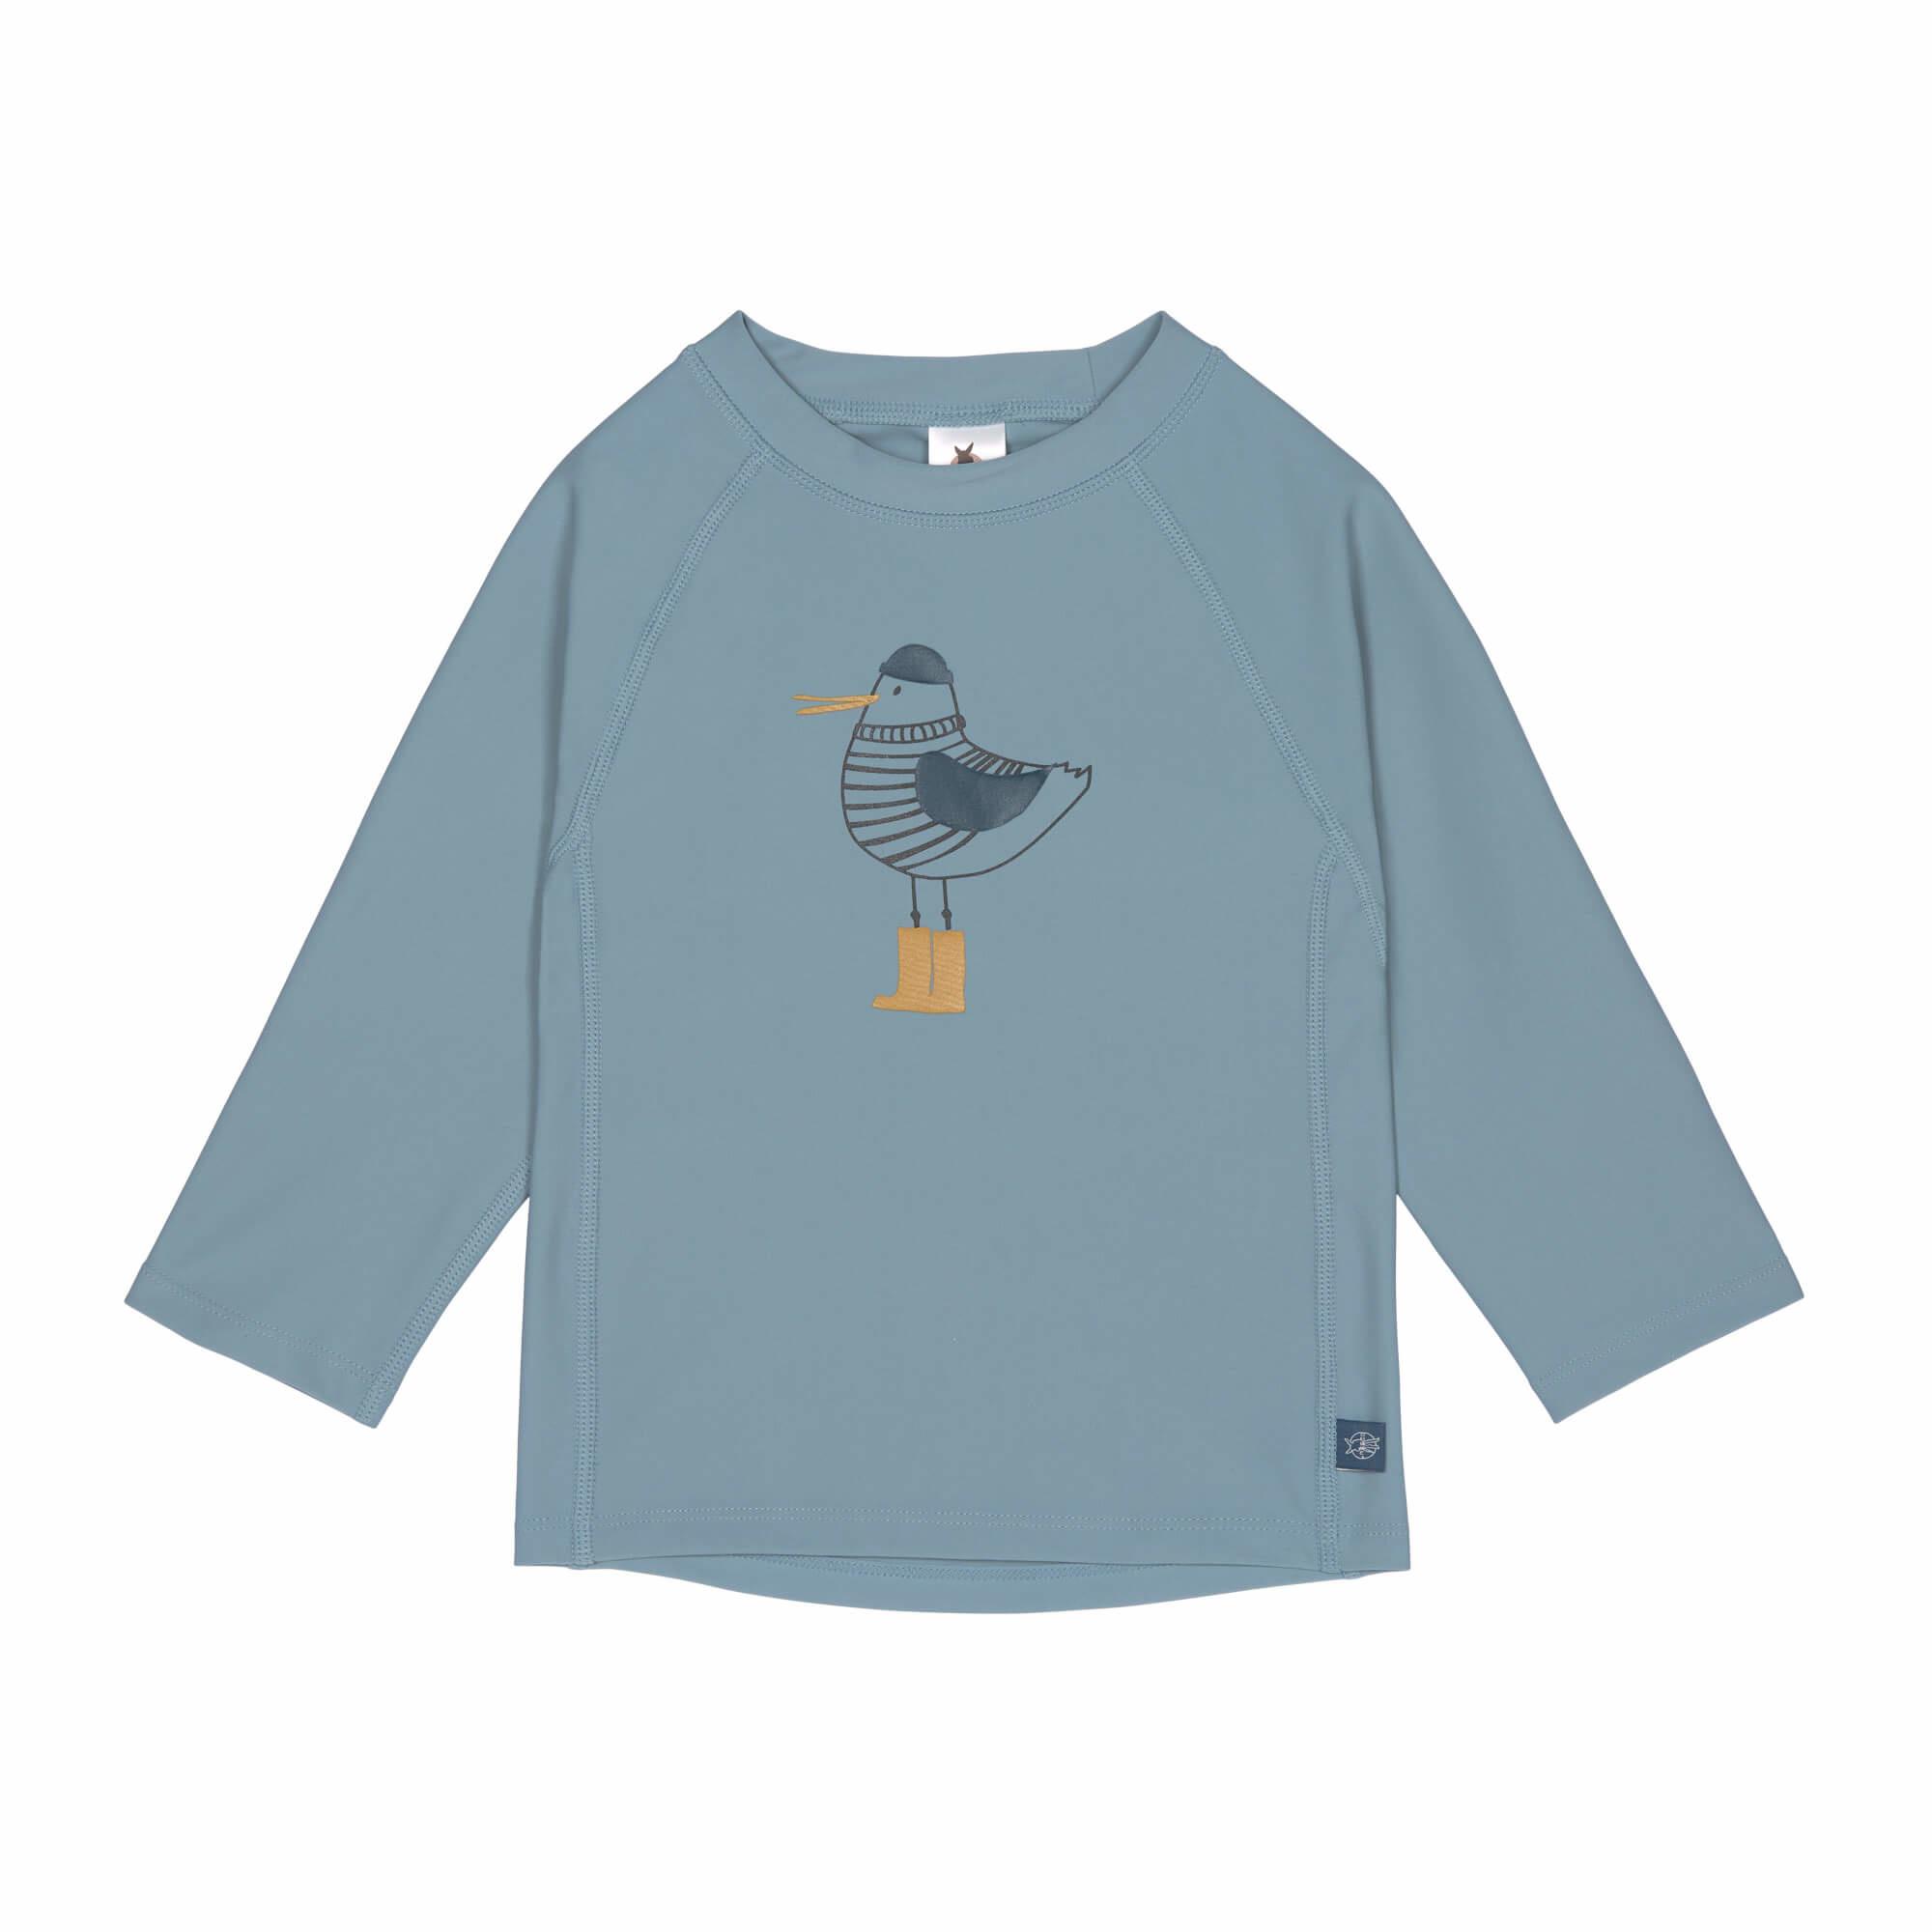 Lässig Splash & Fun Lange mouw Rashguard / zwemshirt Mr. Seagull blue